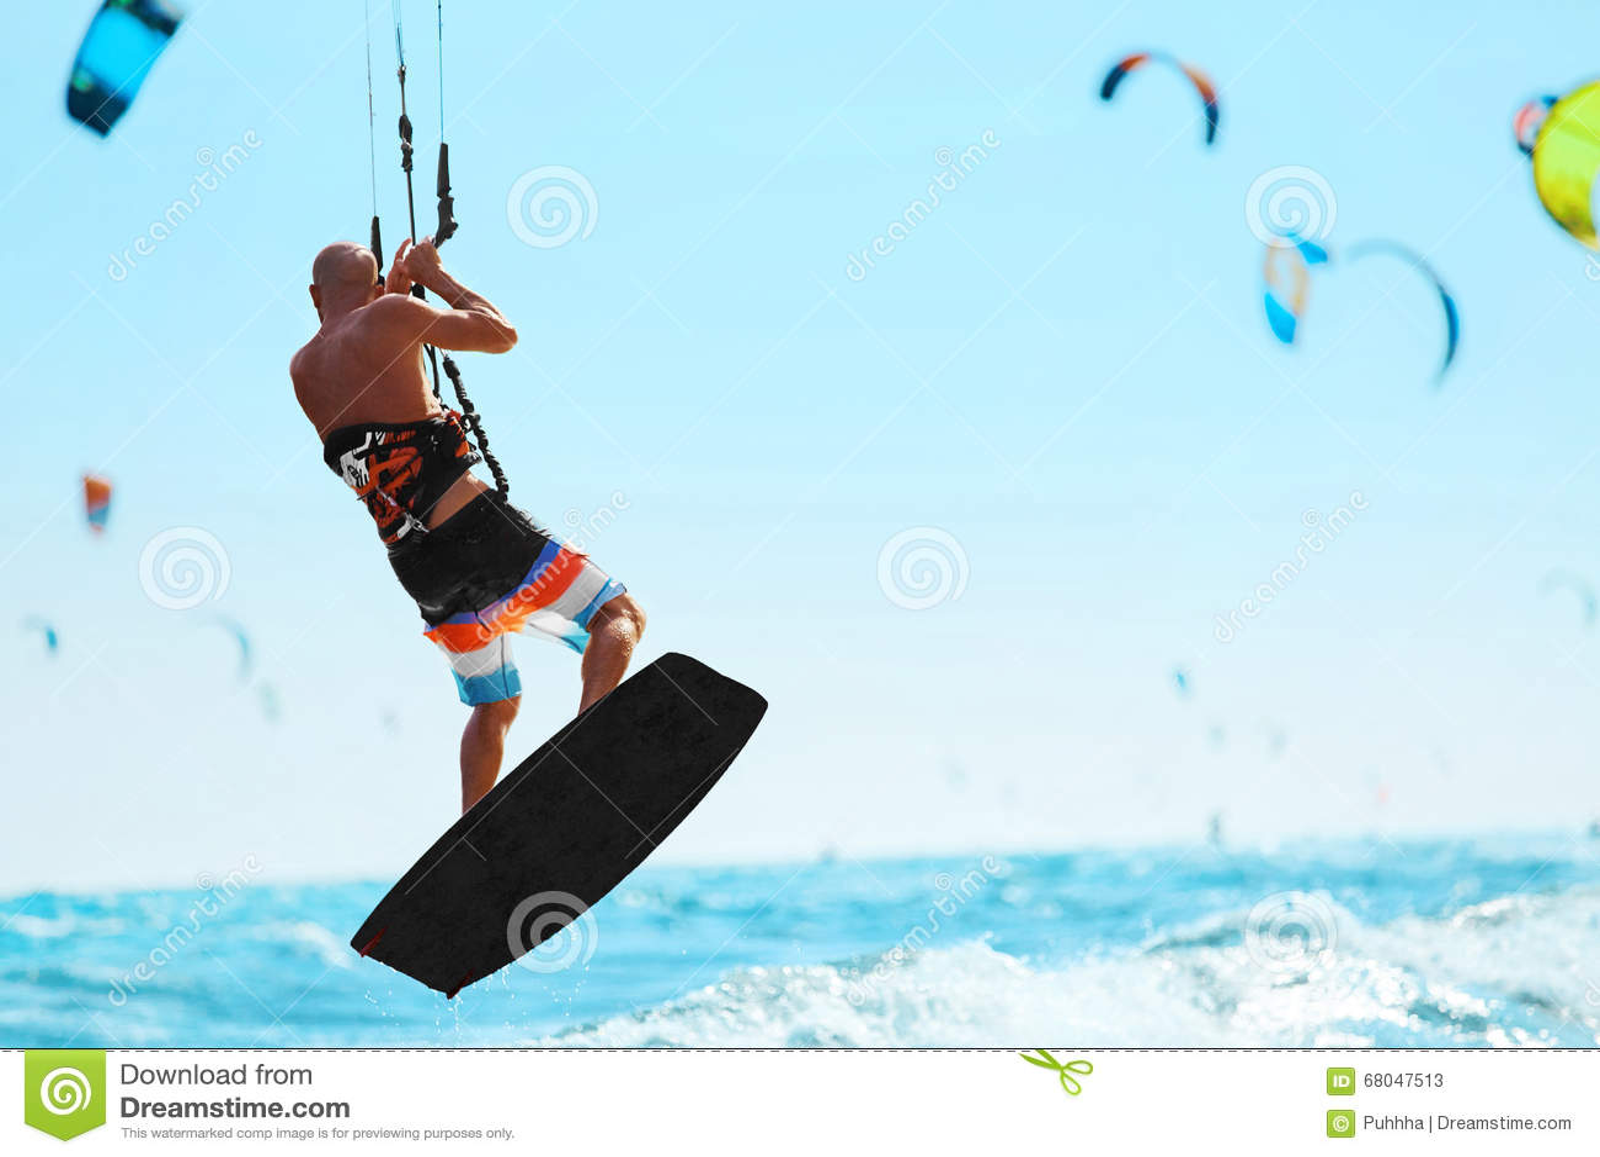 Water Sports. Kiteboarding, Kitesurfing In Ocean. Extreme Sport